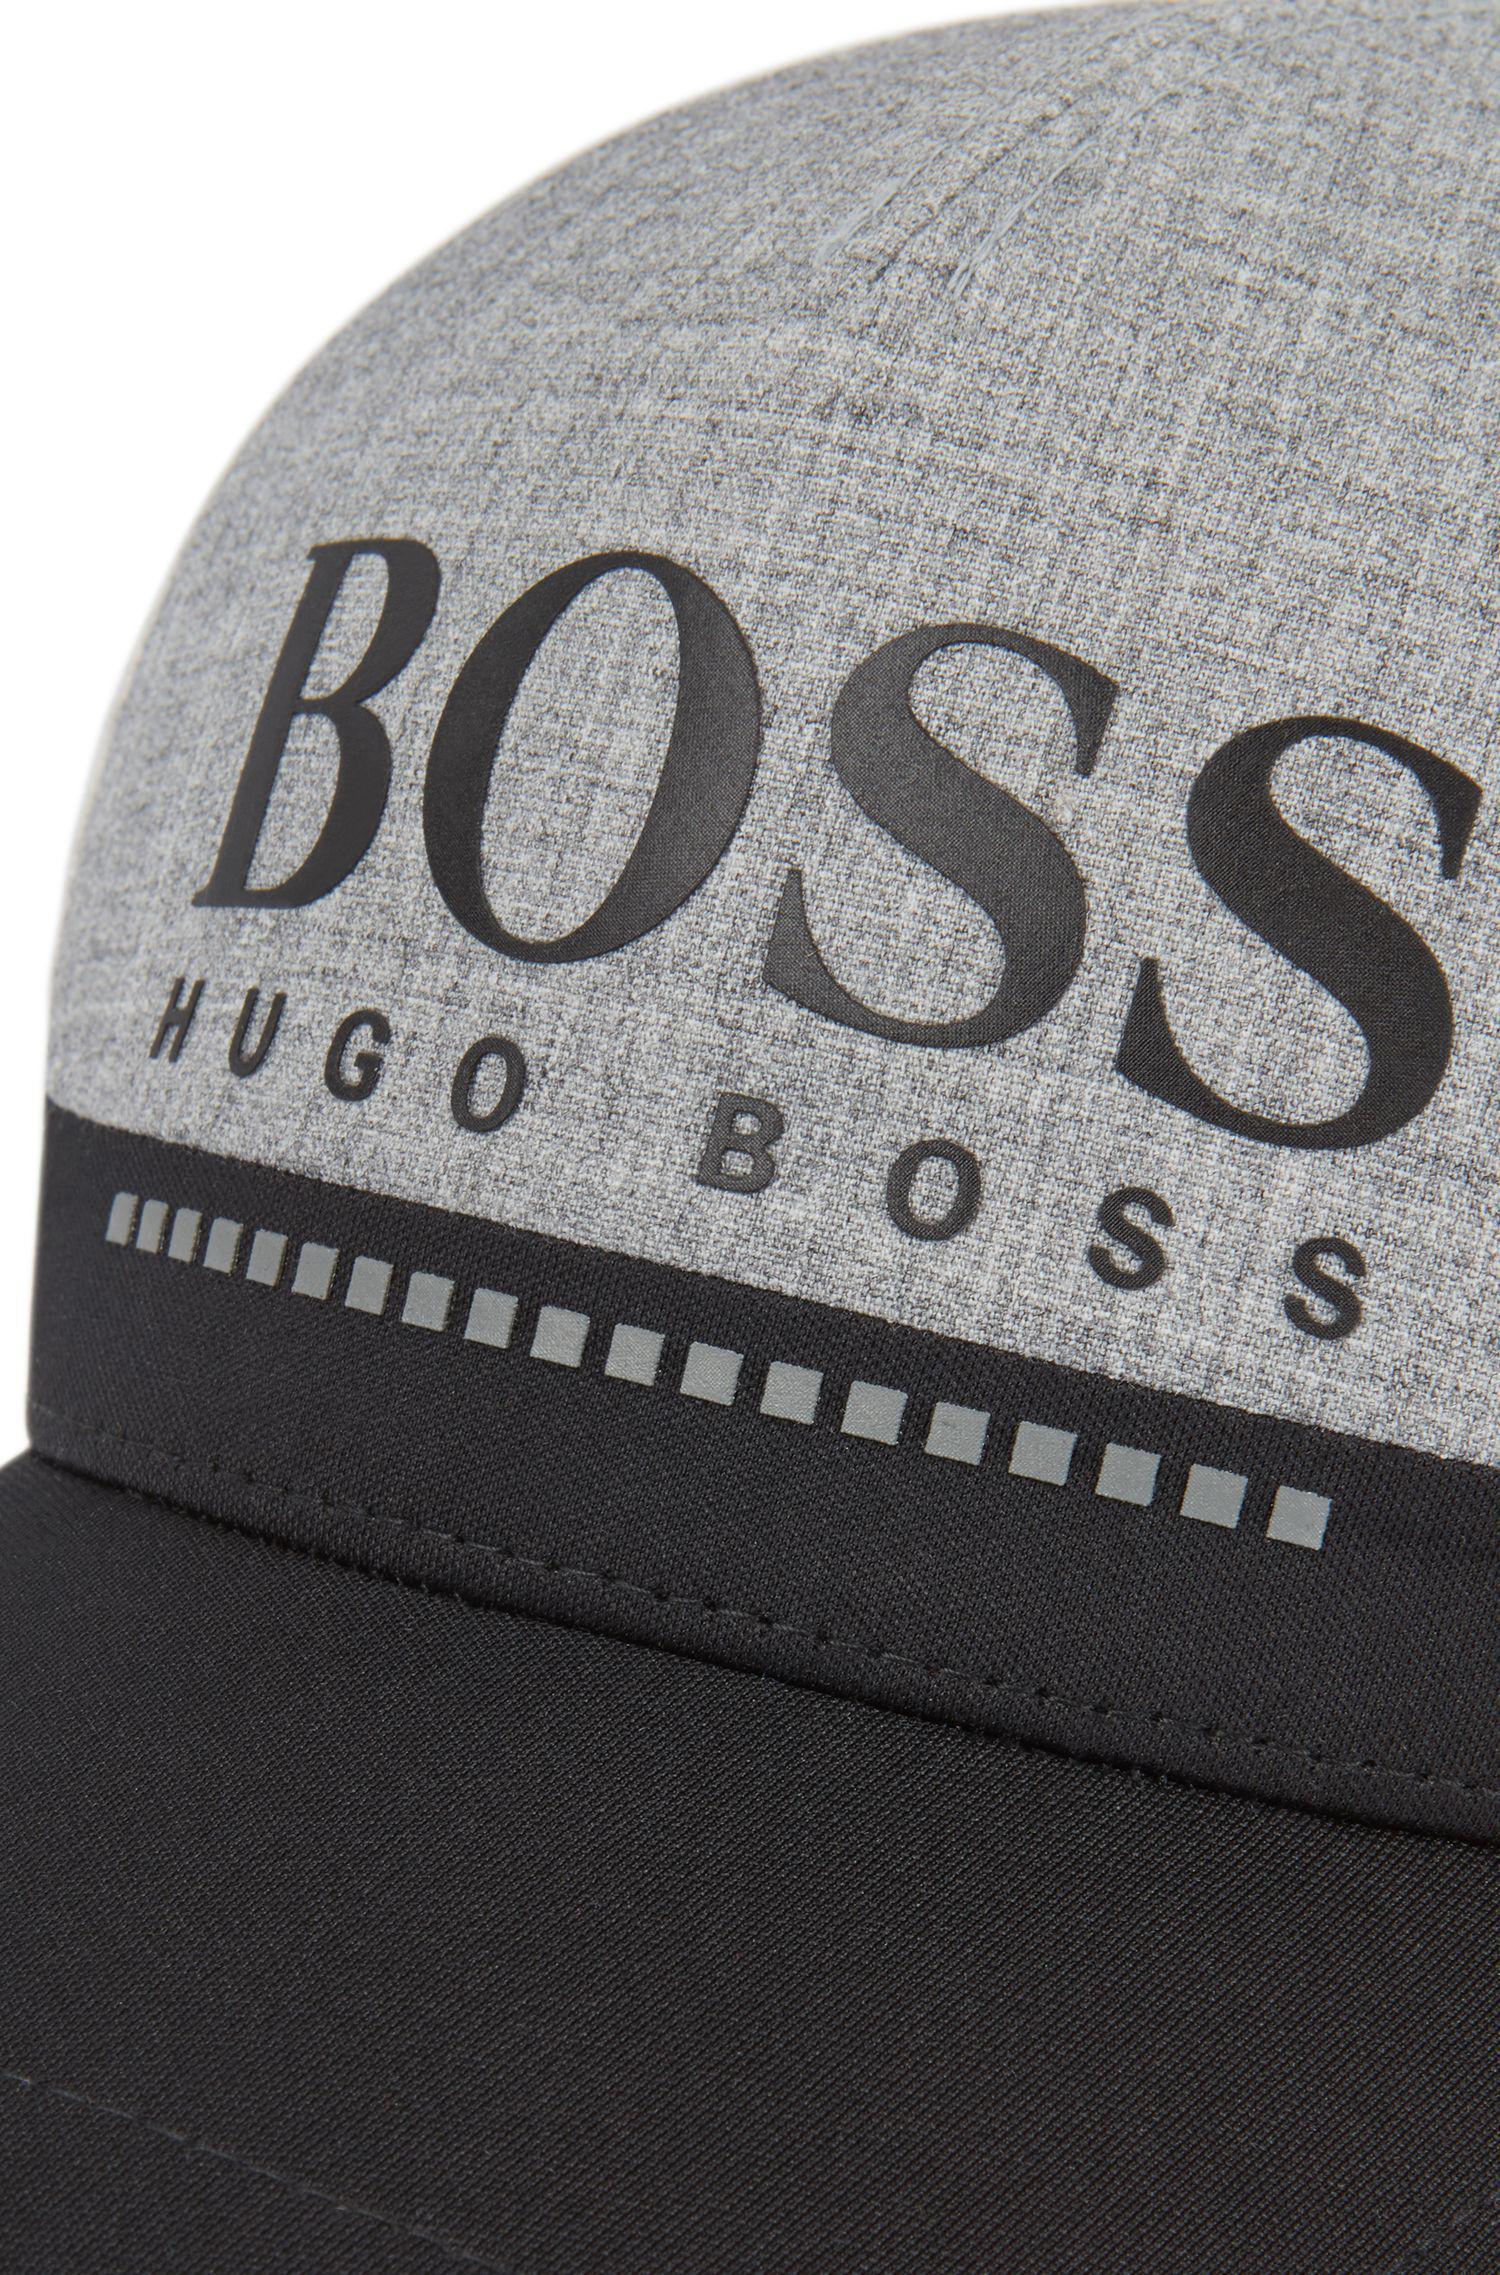 BOSS Mens Contrast Cap Grey in Gray for Men - Lyst 2975ab03b110